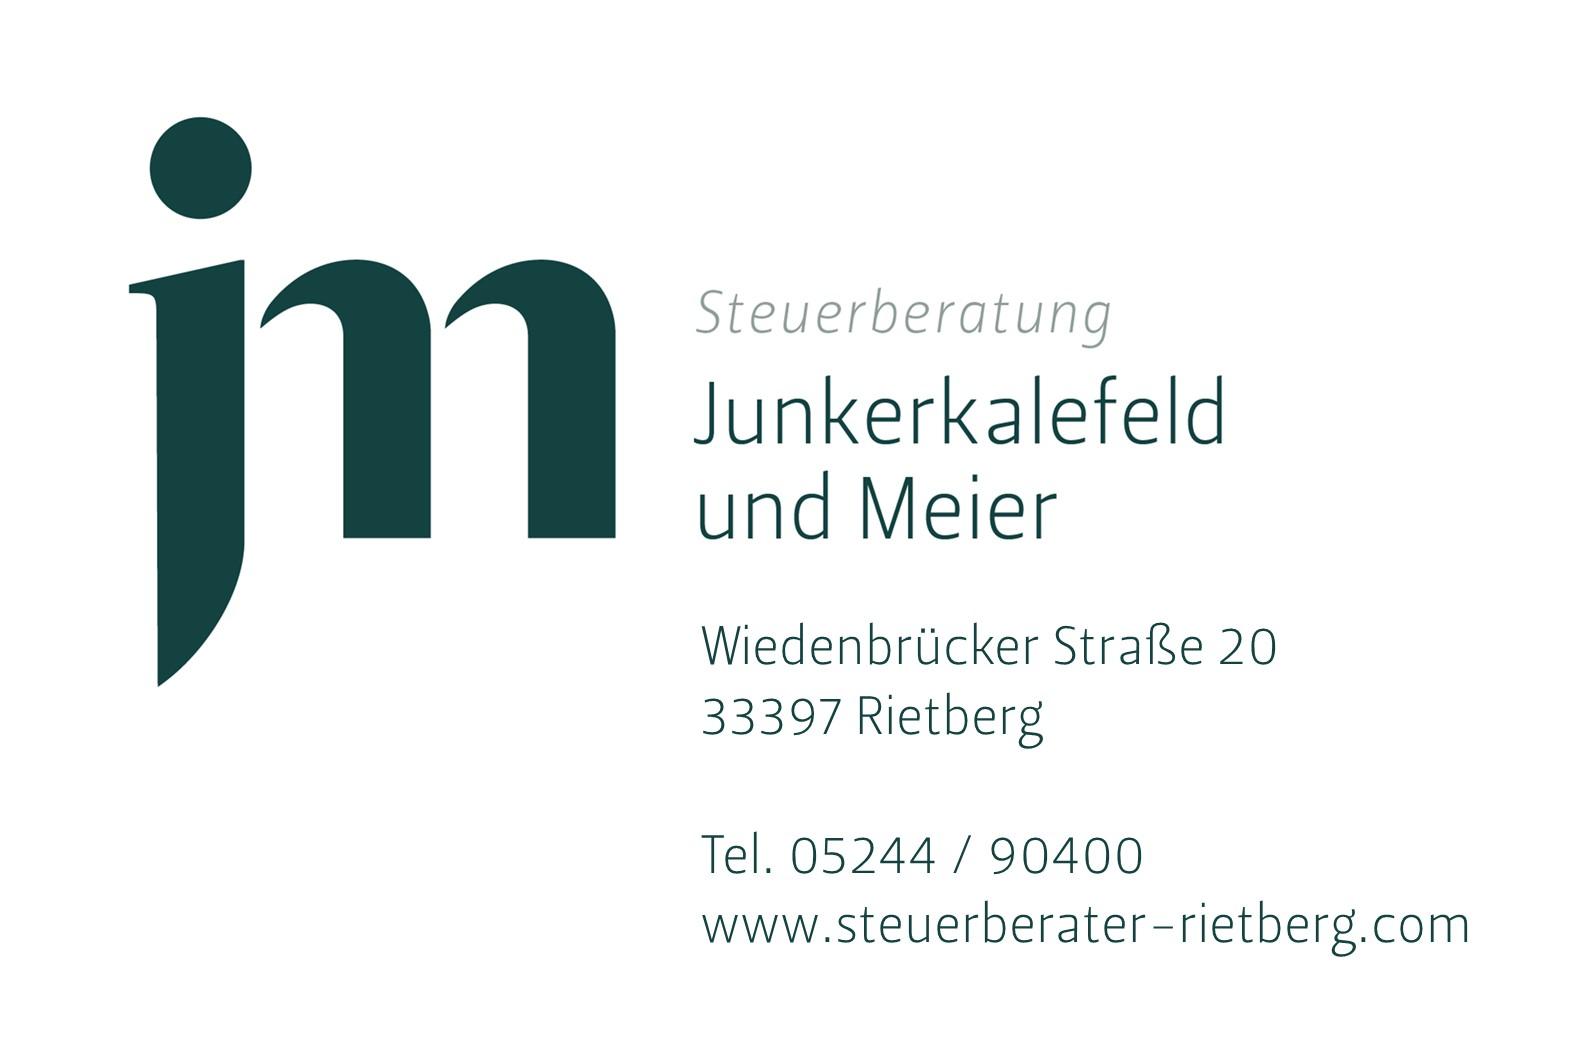 Junkerkalefeld